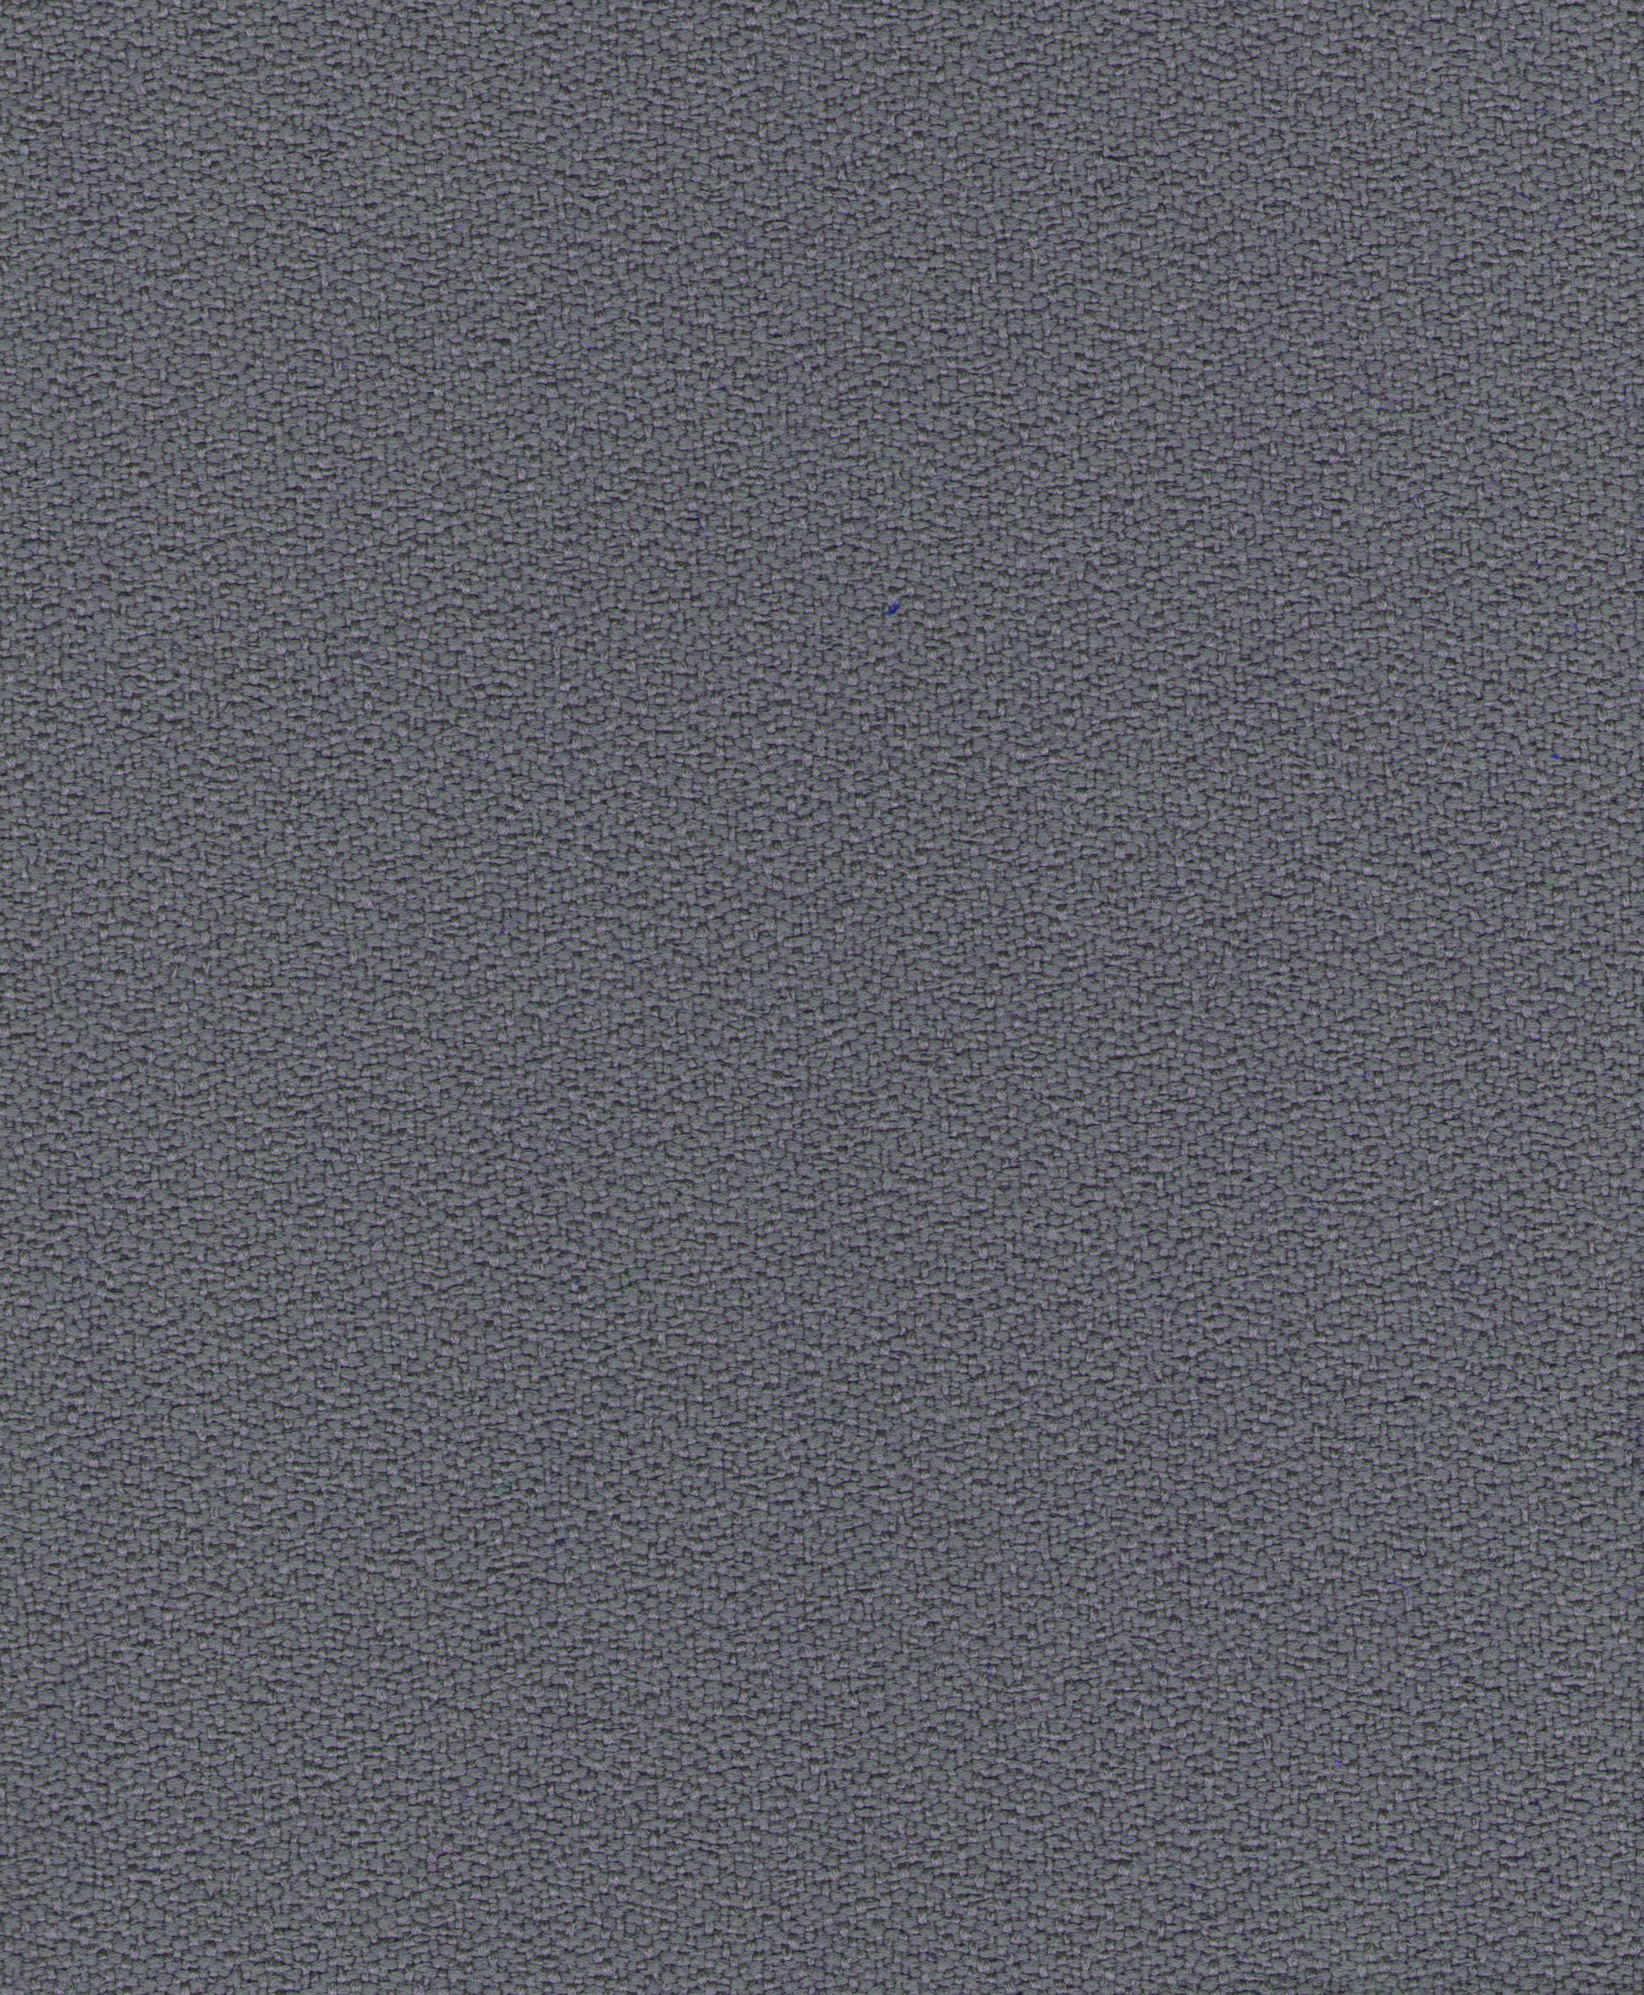 XR081 - 2